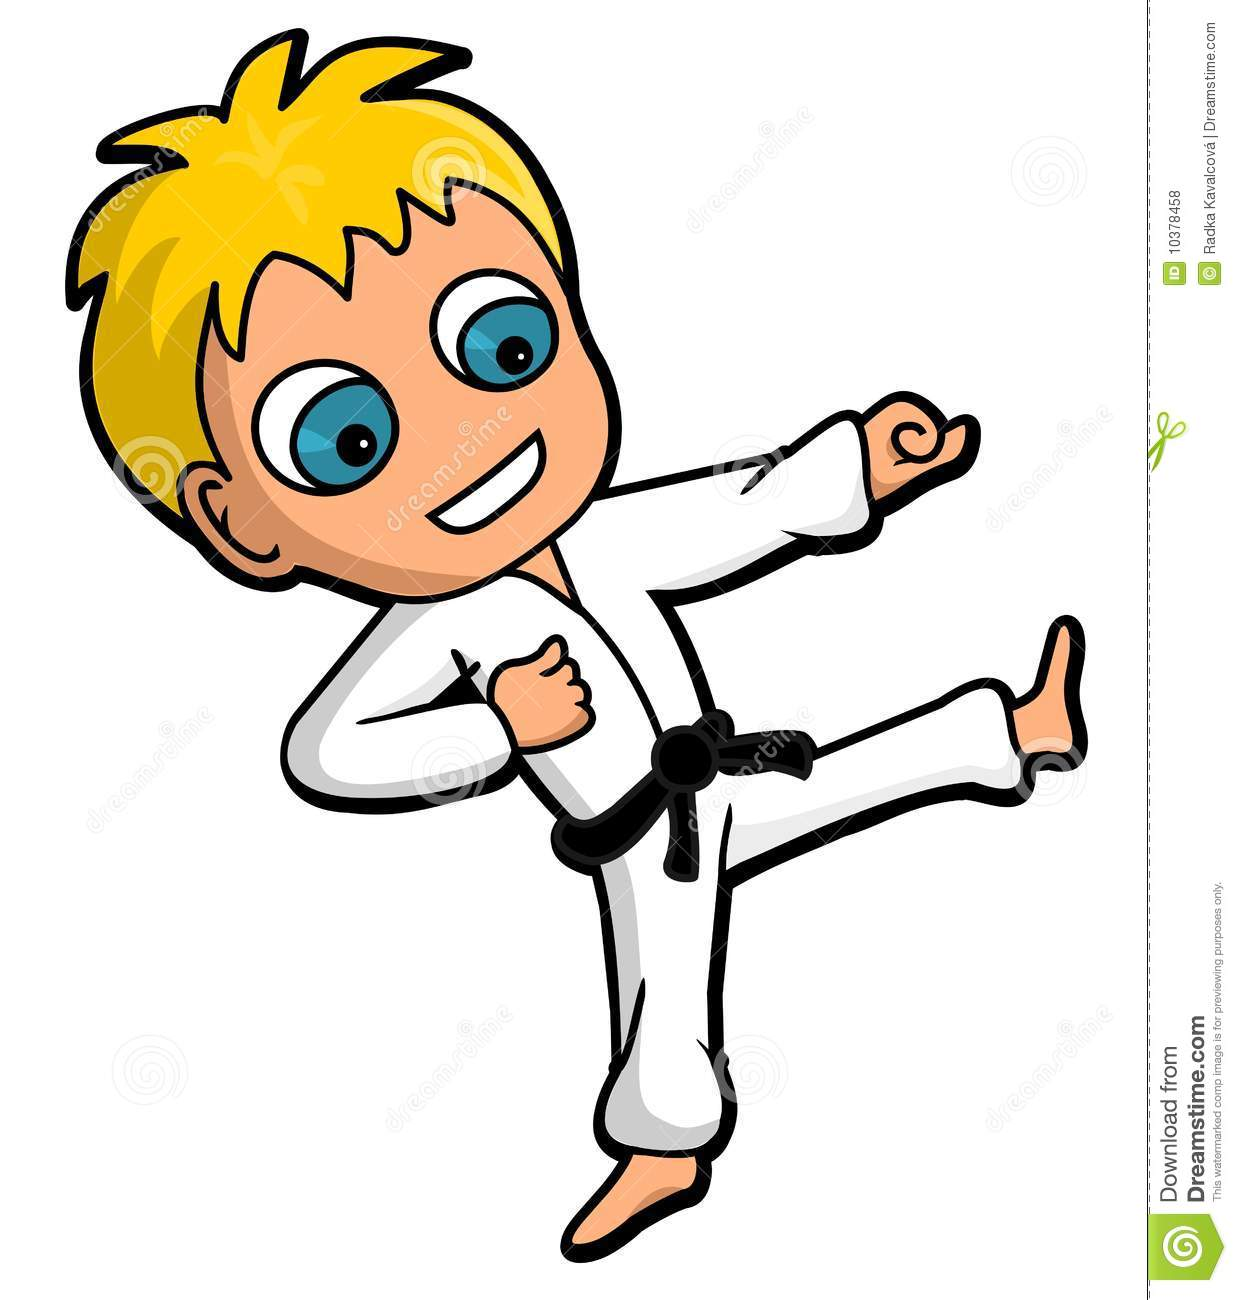 karate kid clipart panda free clipart images rh clipartpanda com karate clip art pictures karate clip art free download